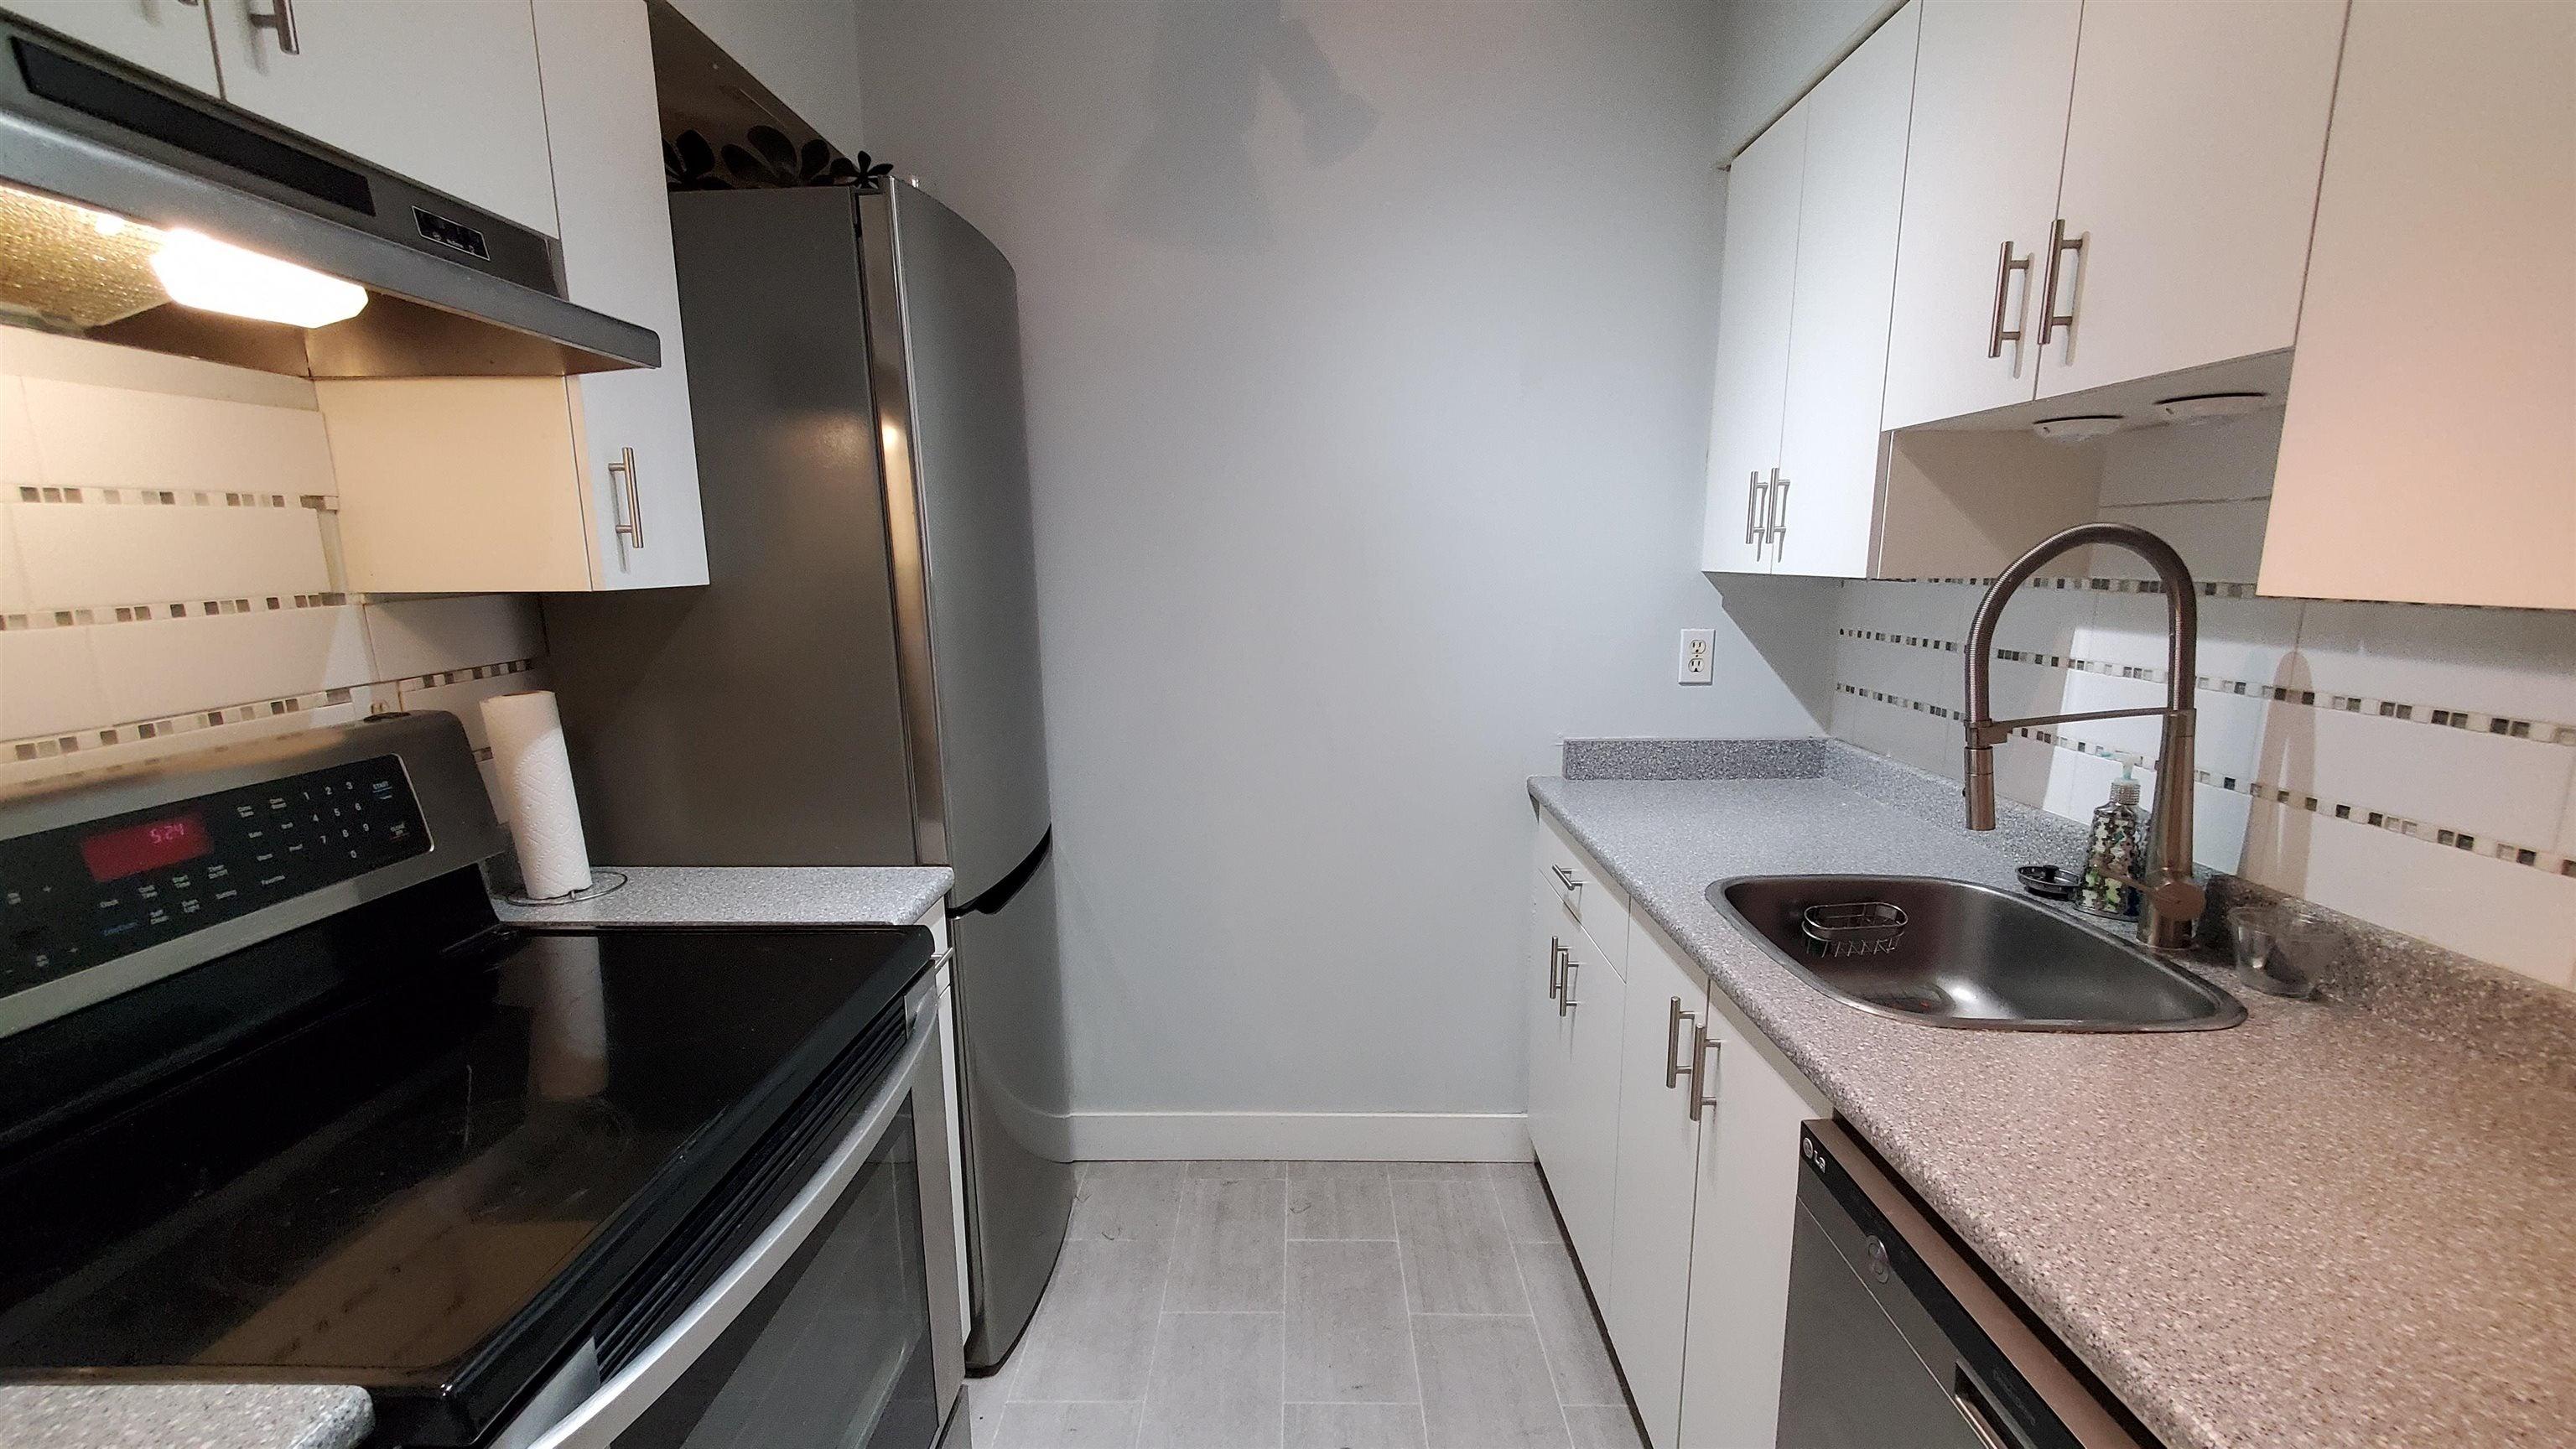 120 11806 88 AVENUE - Annieville Apartment/Condo for sale, 2 Bedrooms (R2616862) - #7